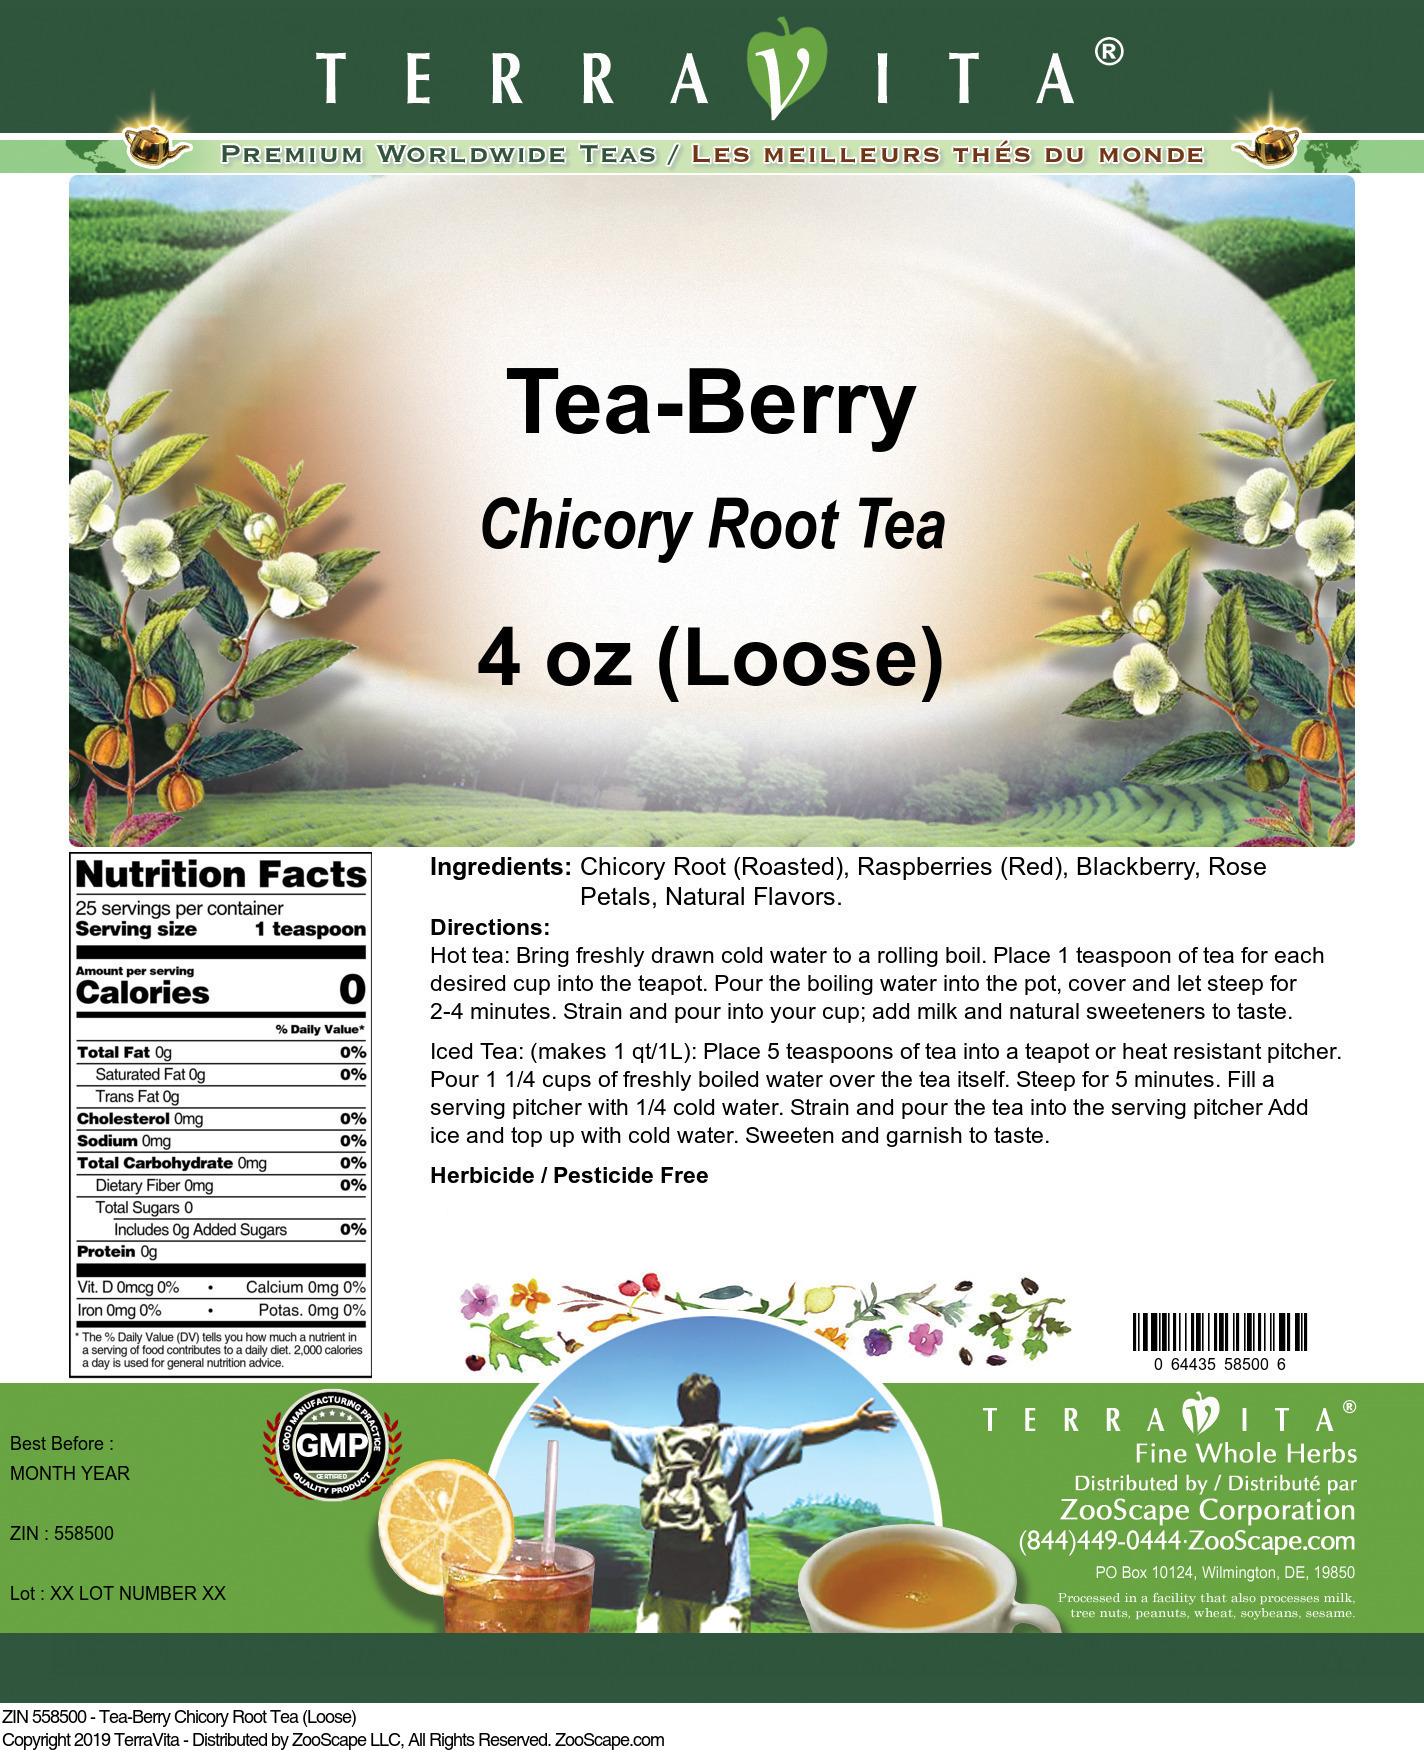 Tea-Berry Chicory Root